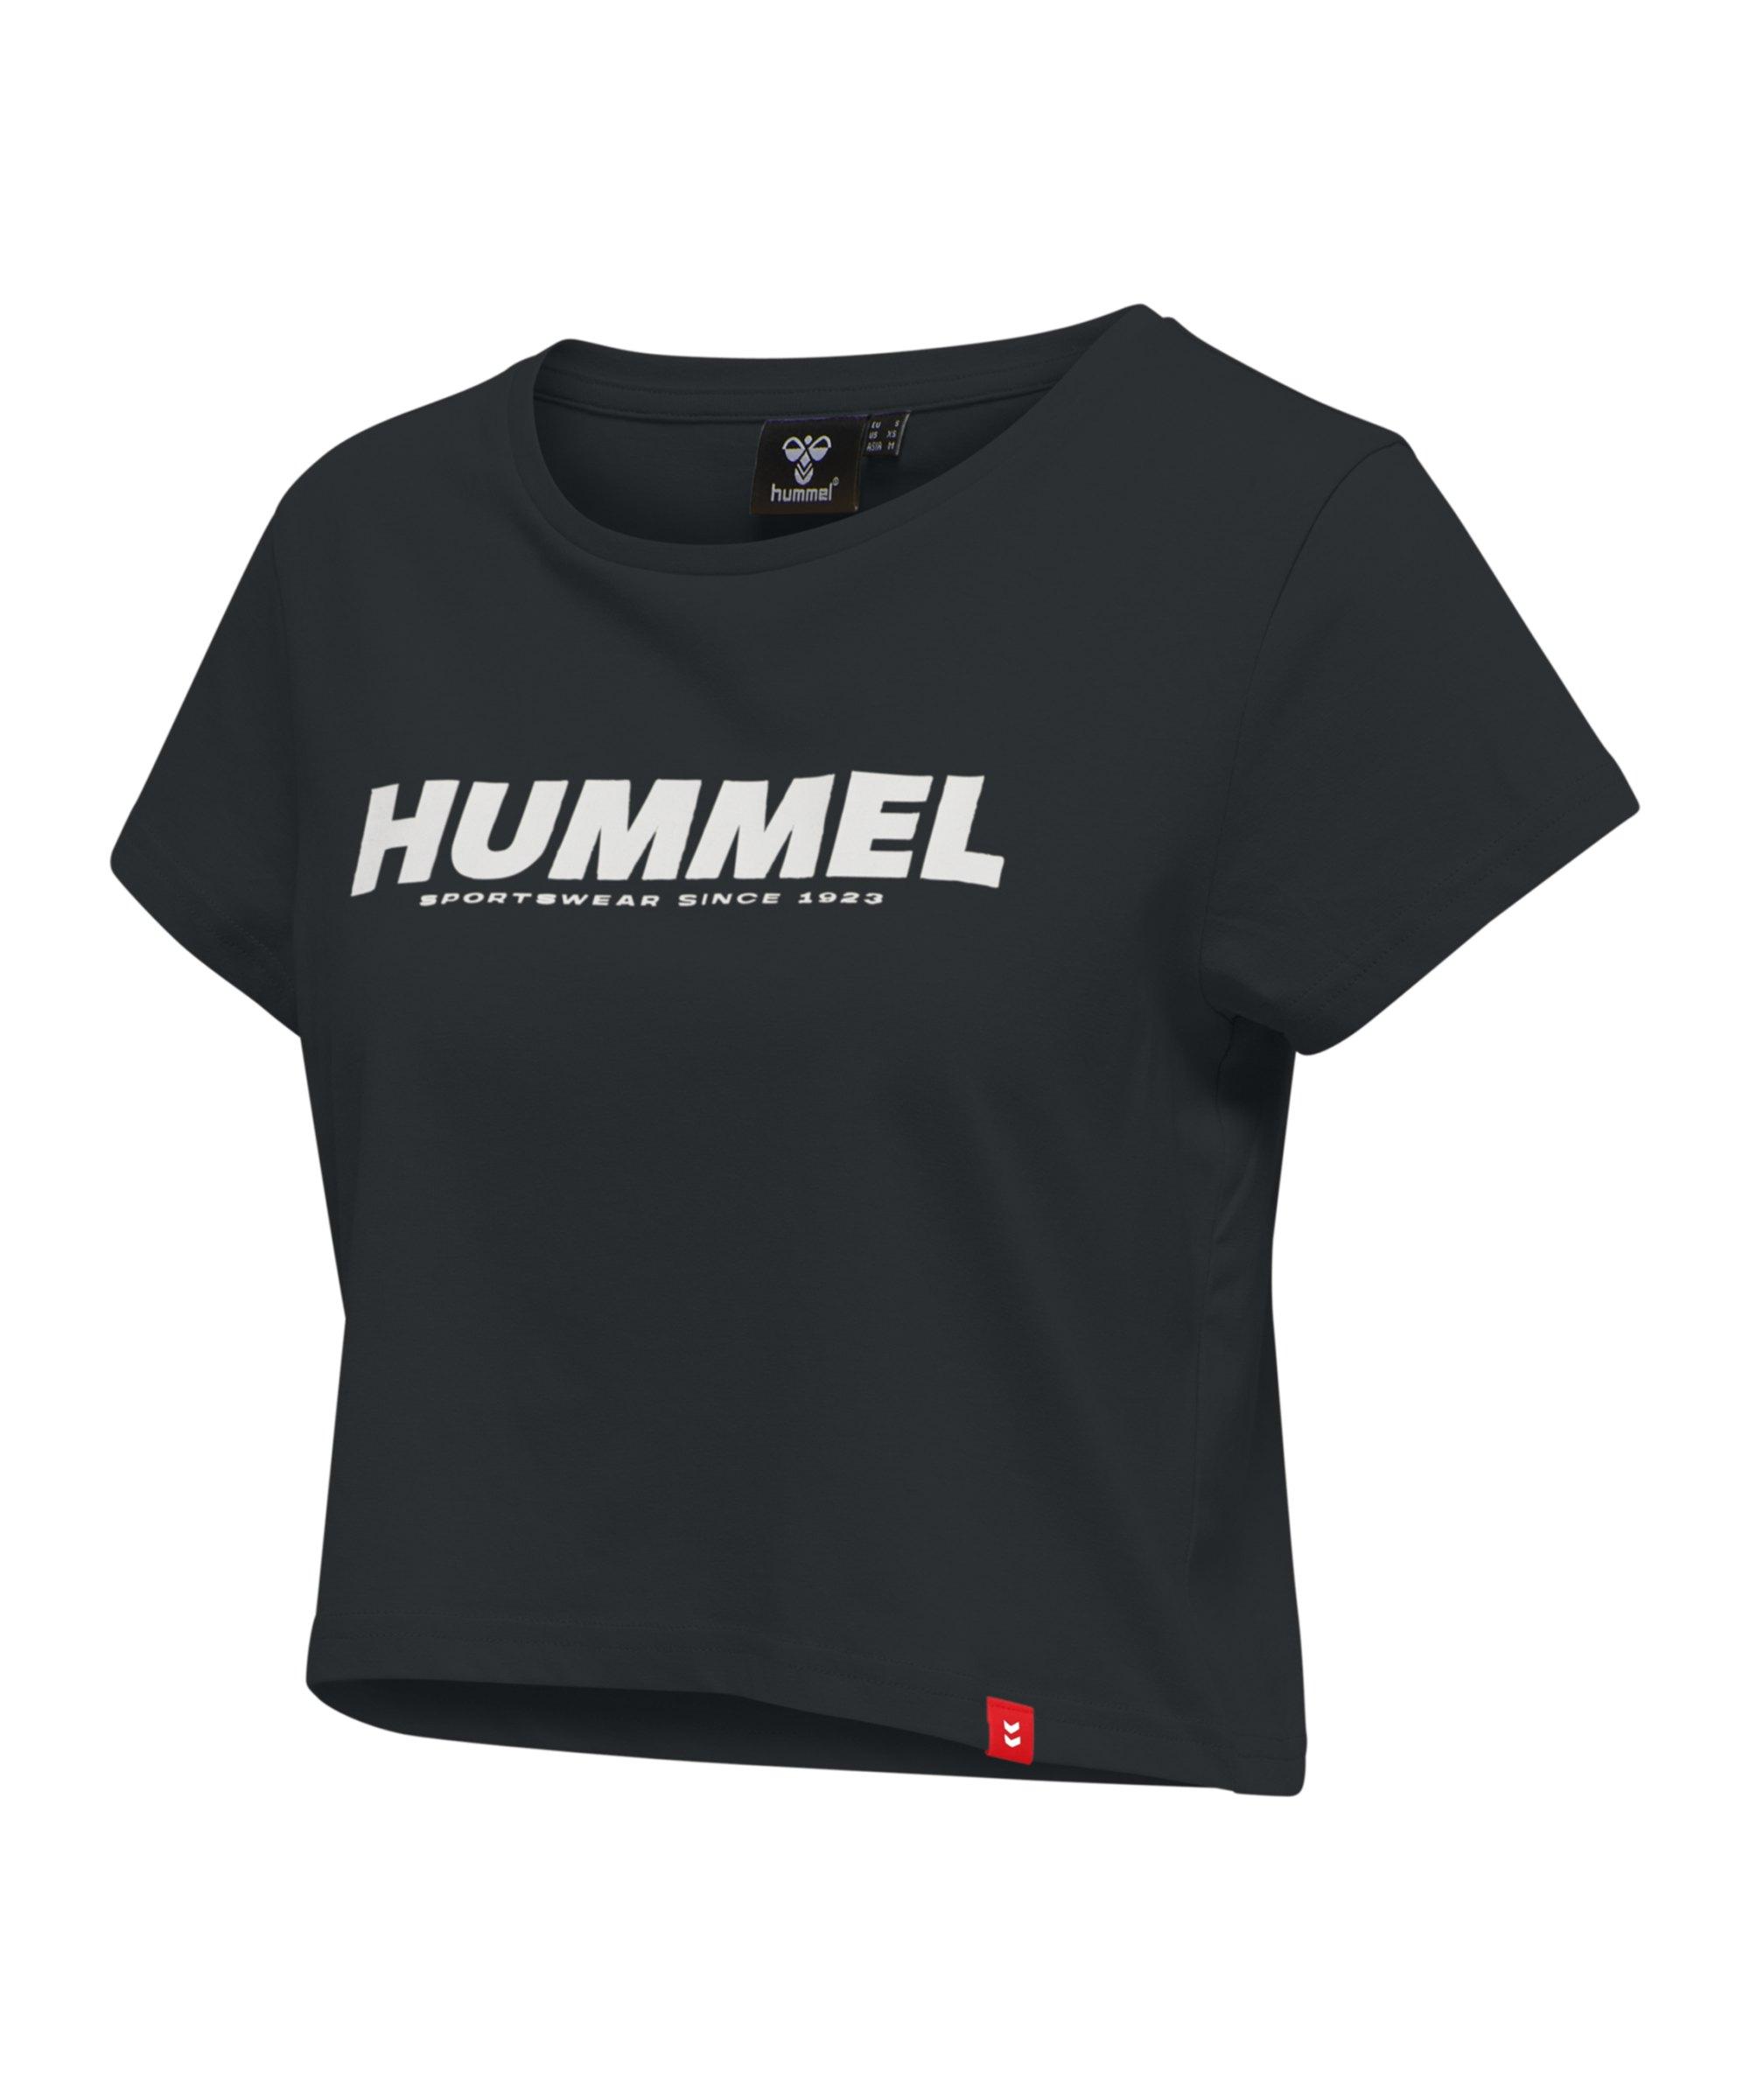 Hummel Legacy Cropped T-Shirt Damen Schwarz F2001 - schwarz